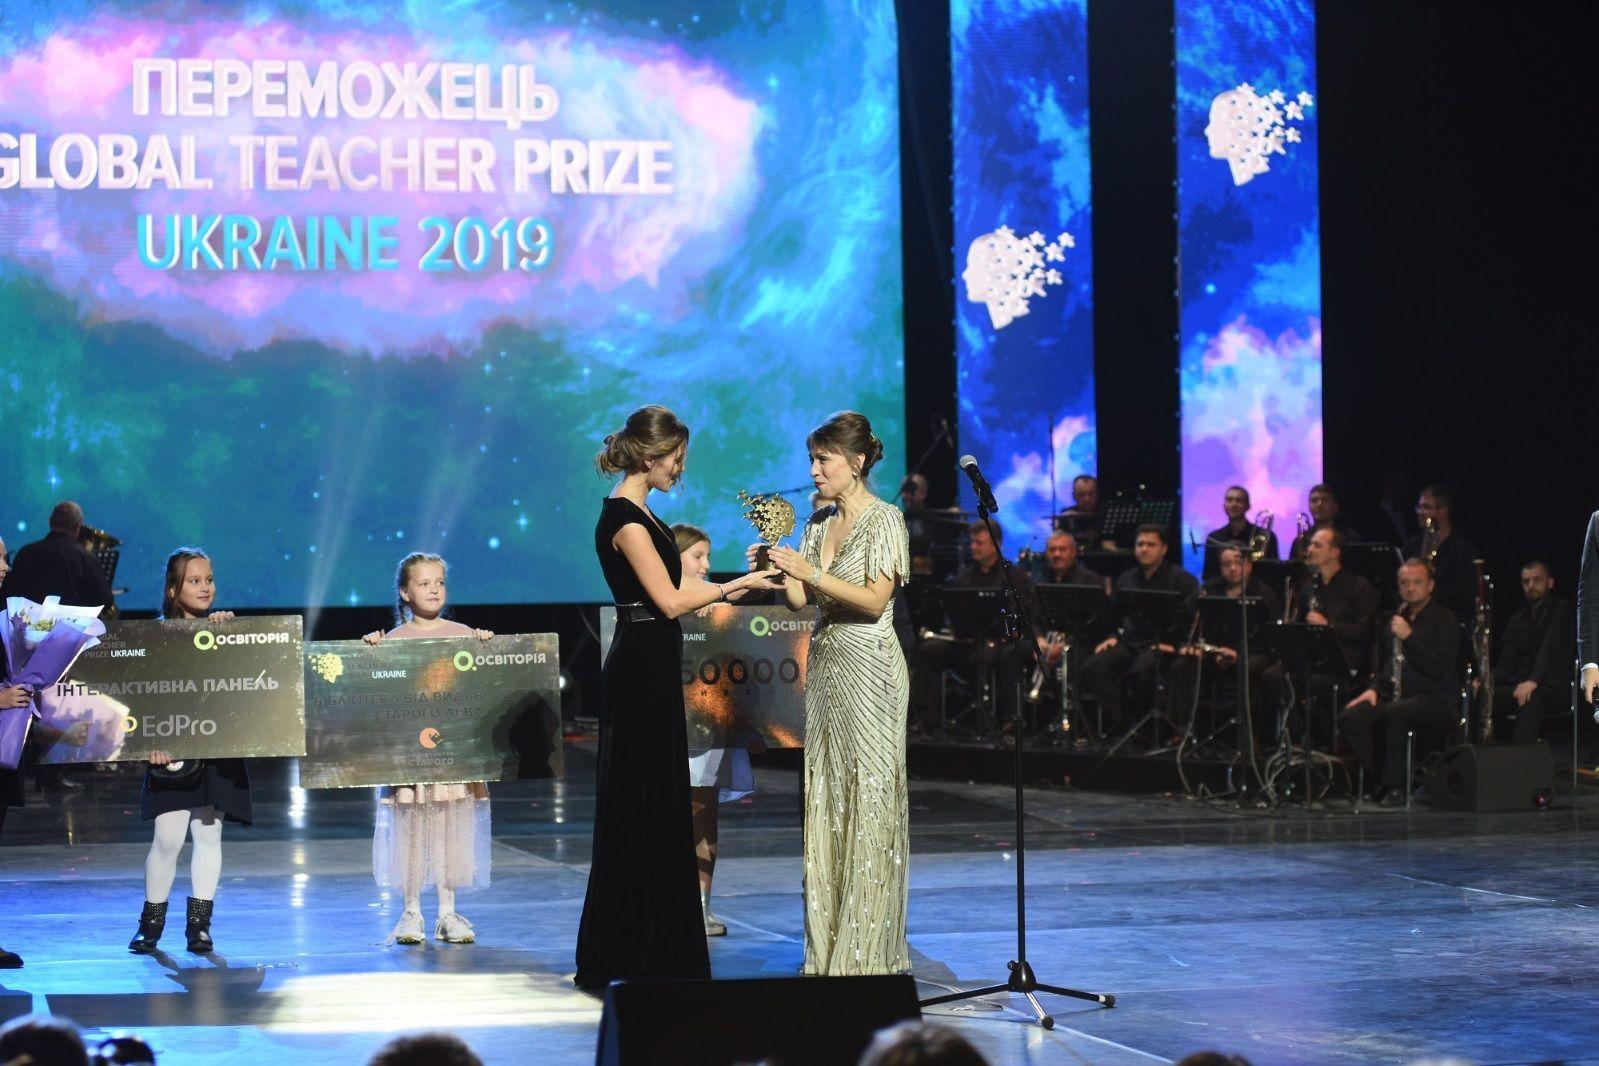 Global Teacher Prize Ukraine